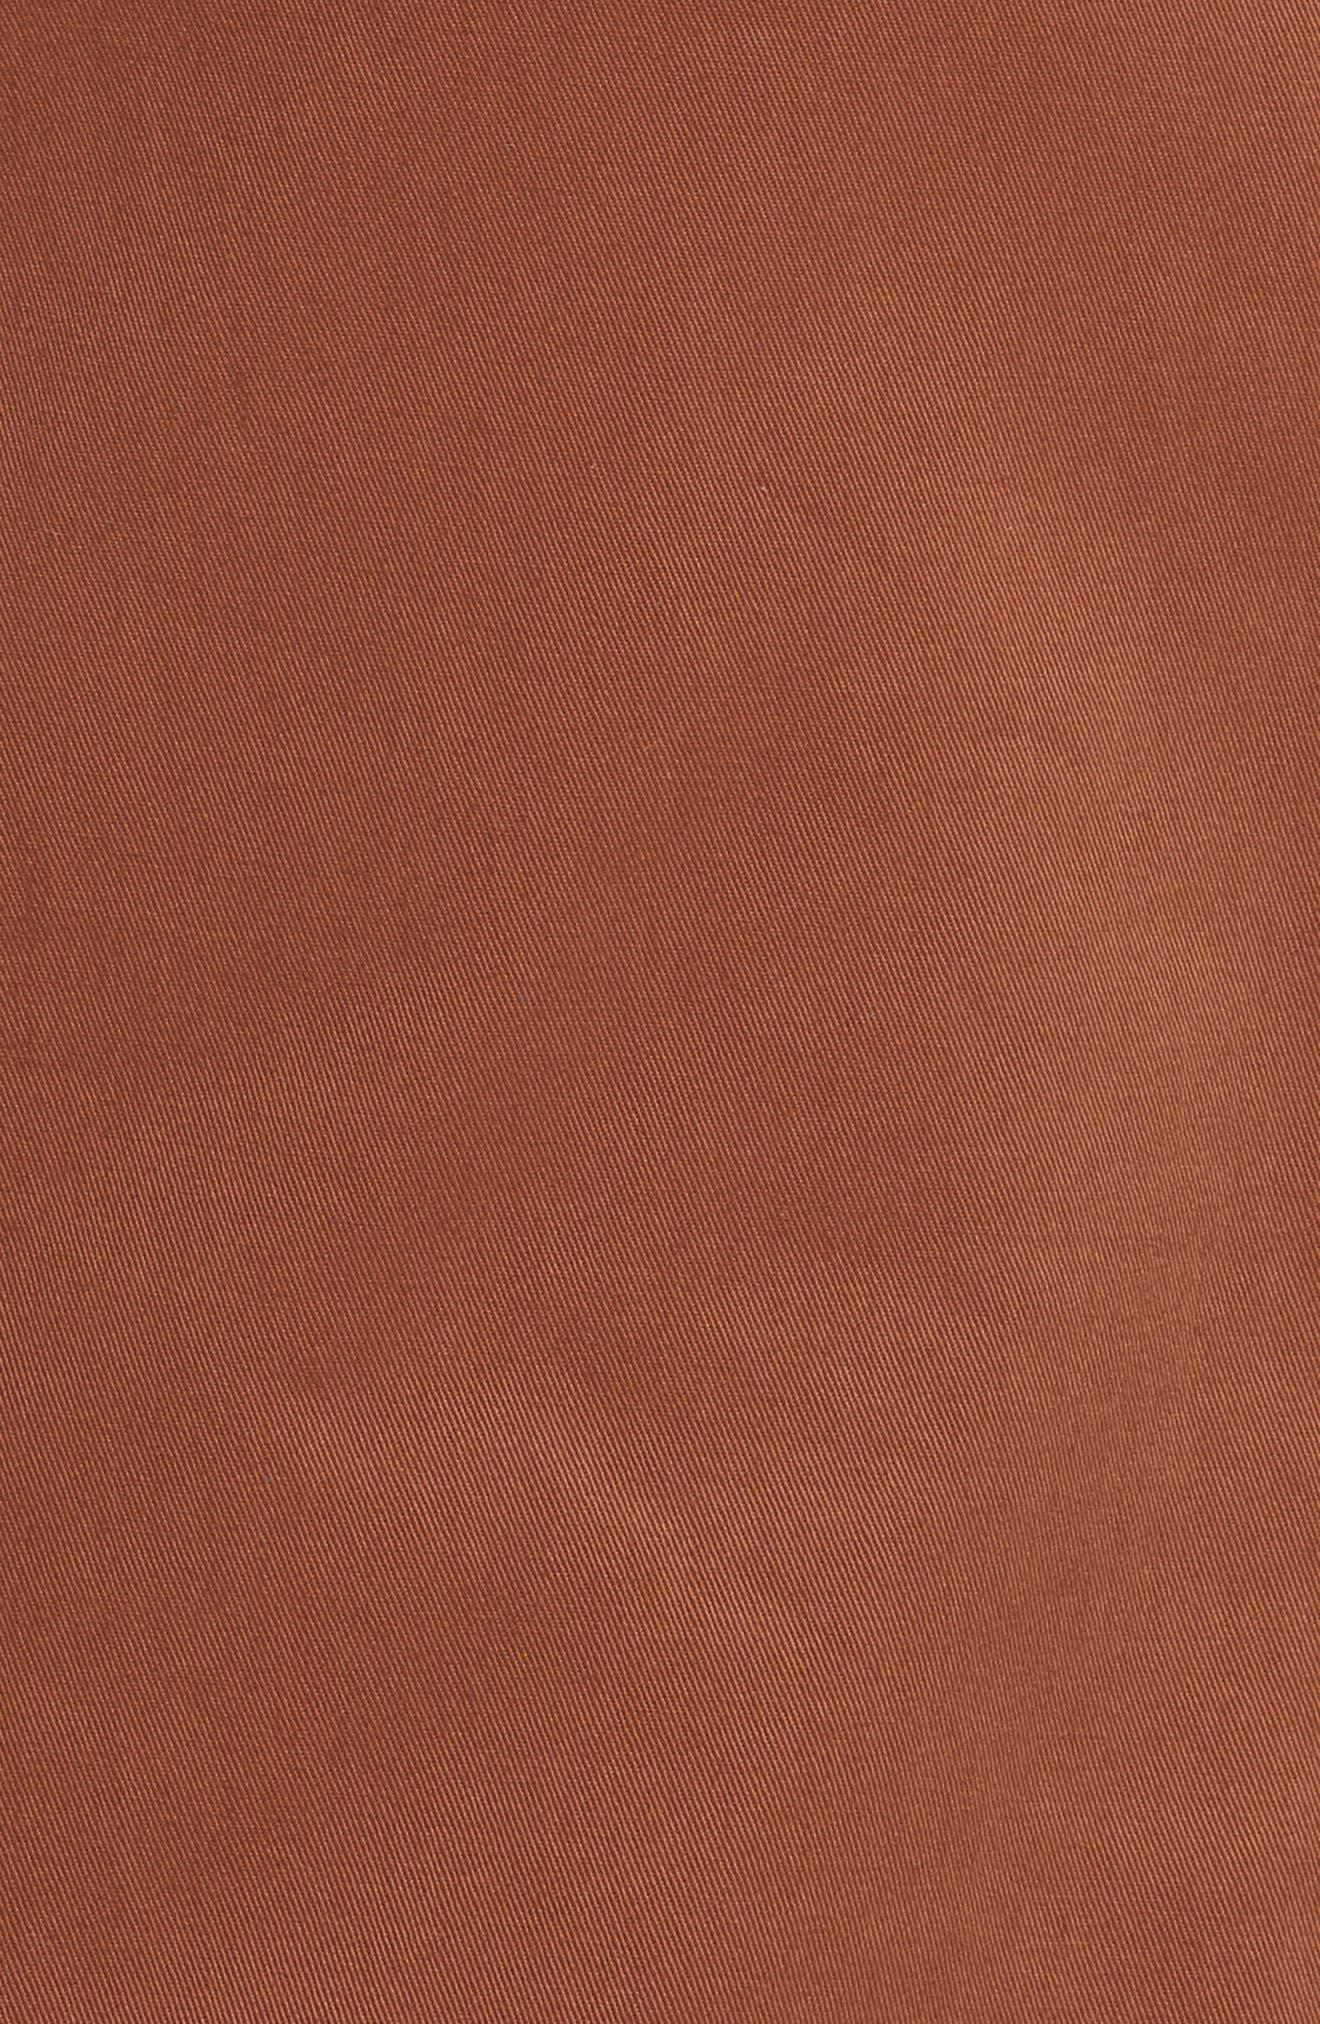 Diane von Furstenberg Midi Twill Pencil Skirt,                             Alternate thumbnail 5, color,                             203